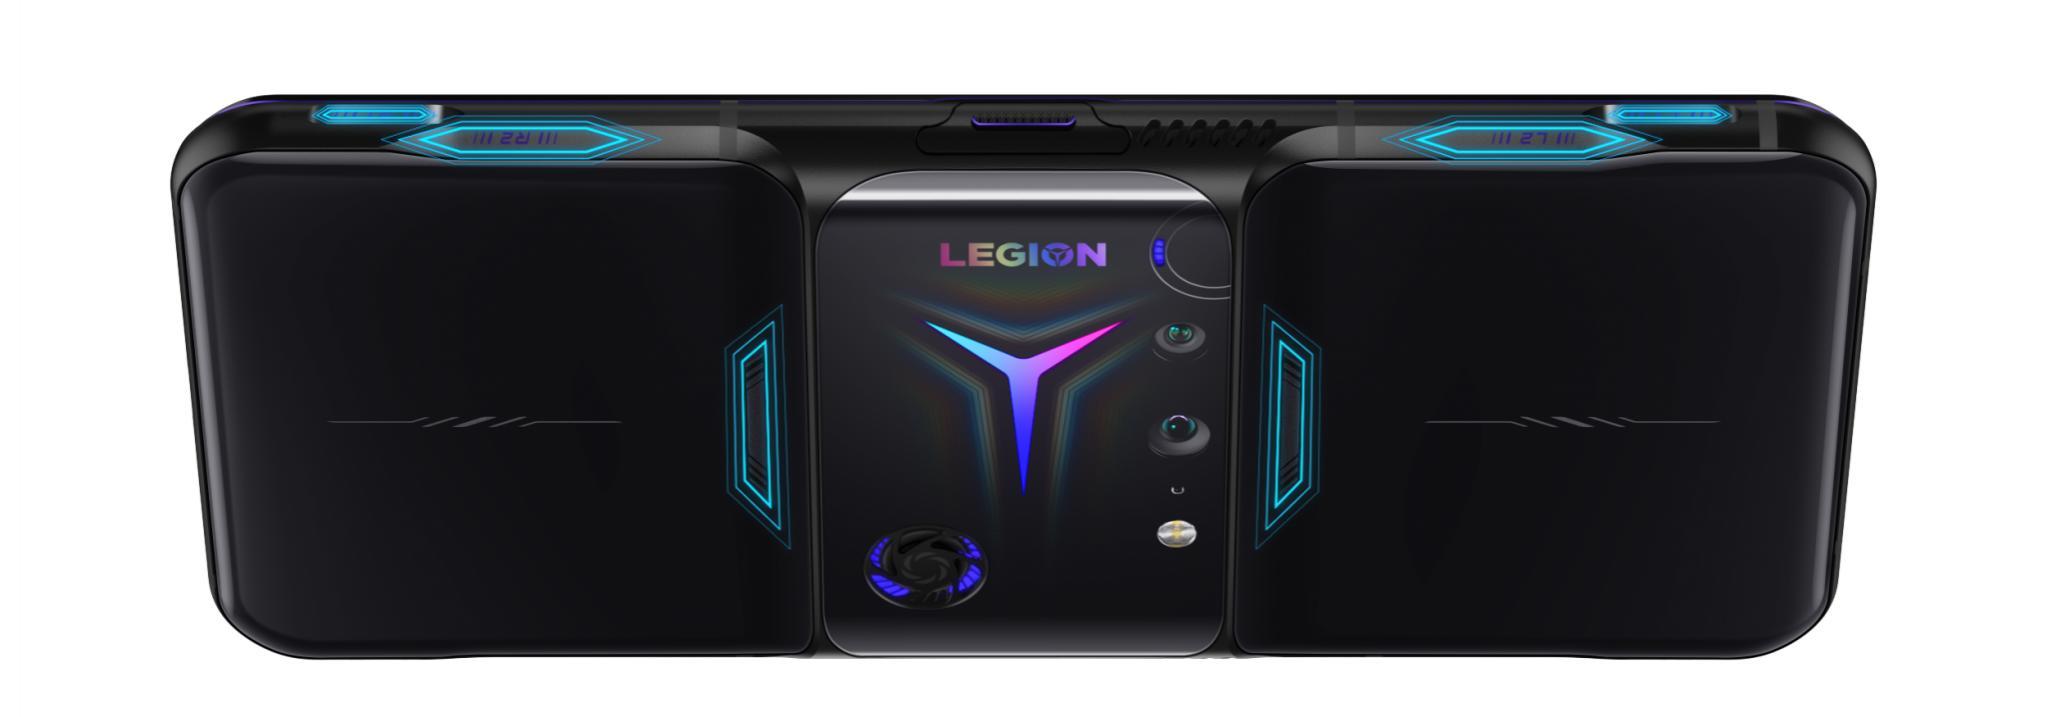 Name:  Lenovo-Legion-Phone-Duel-2_Ultimate-Black_Octa-Triggericon-1-e1617741259212-2048x717.jpg Views: 107 Size:  72.1 KB